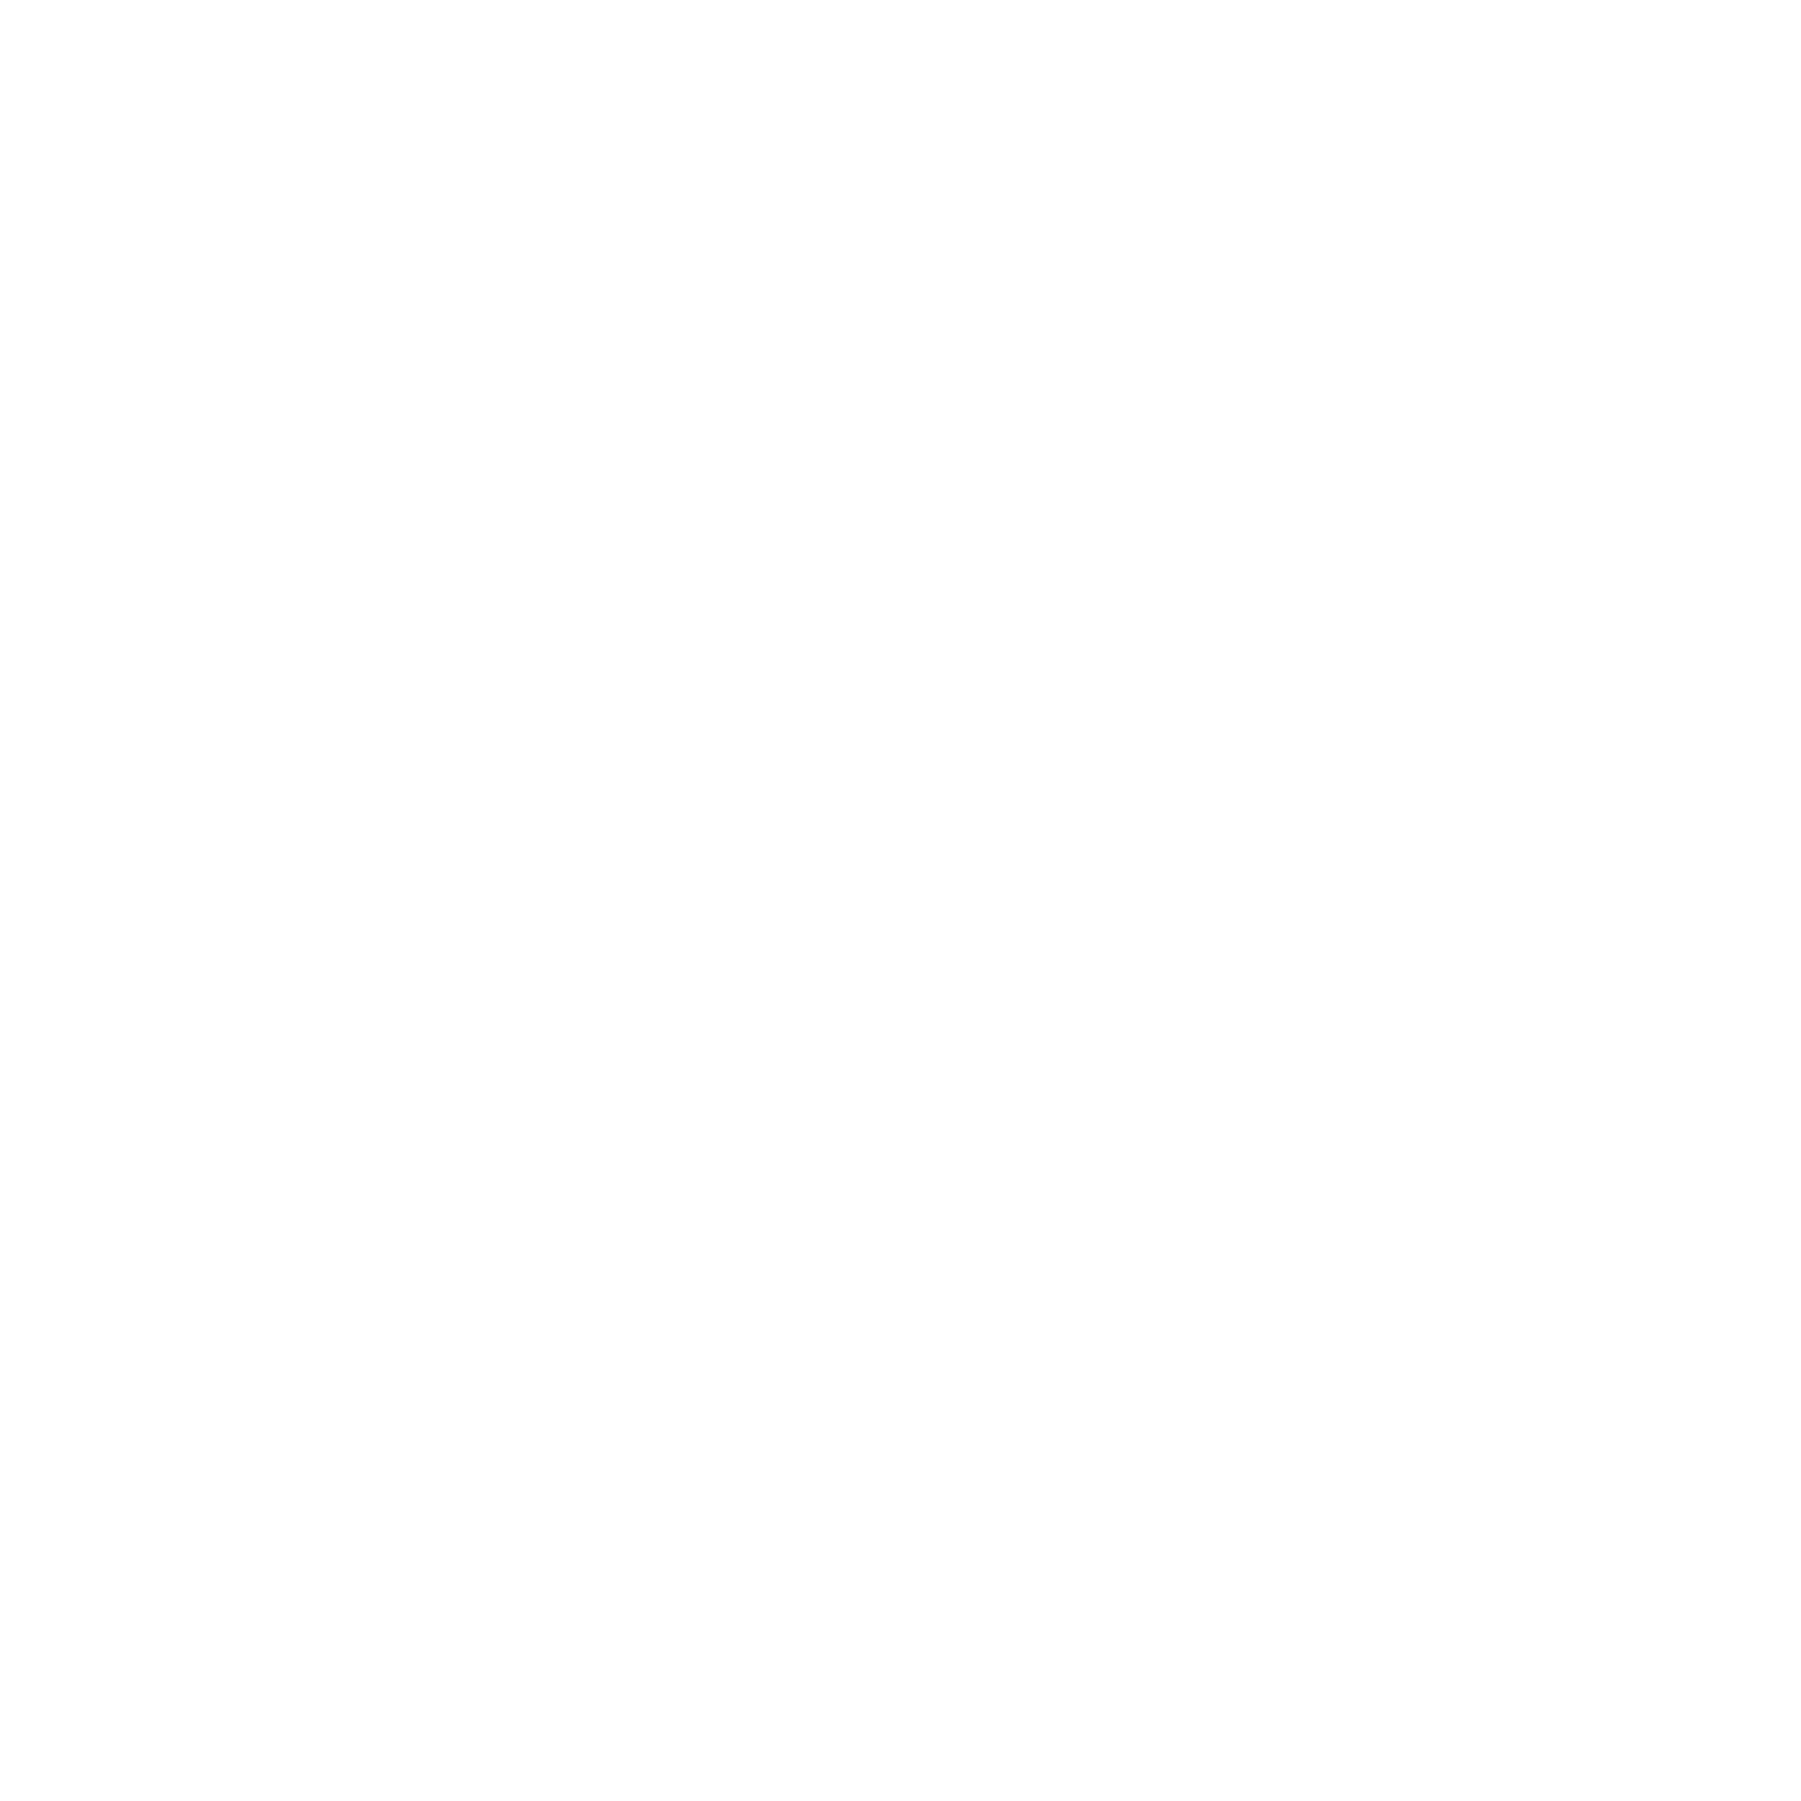 BaltSchoolMusic_White_Final-01.png